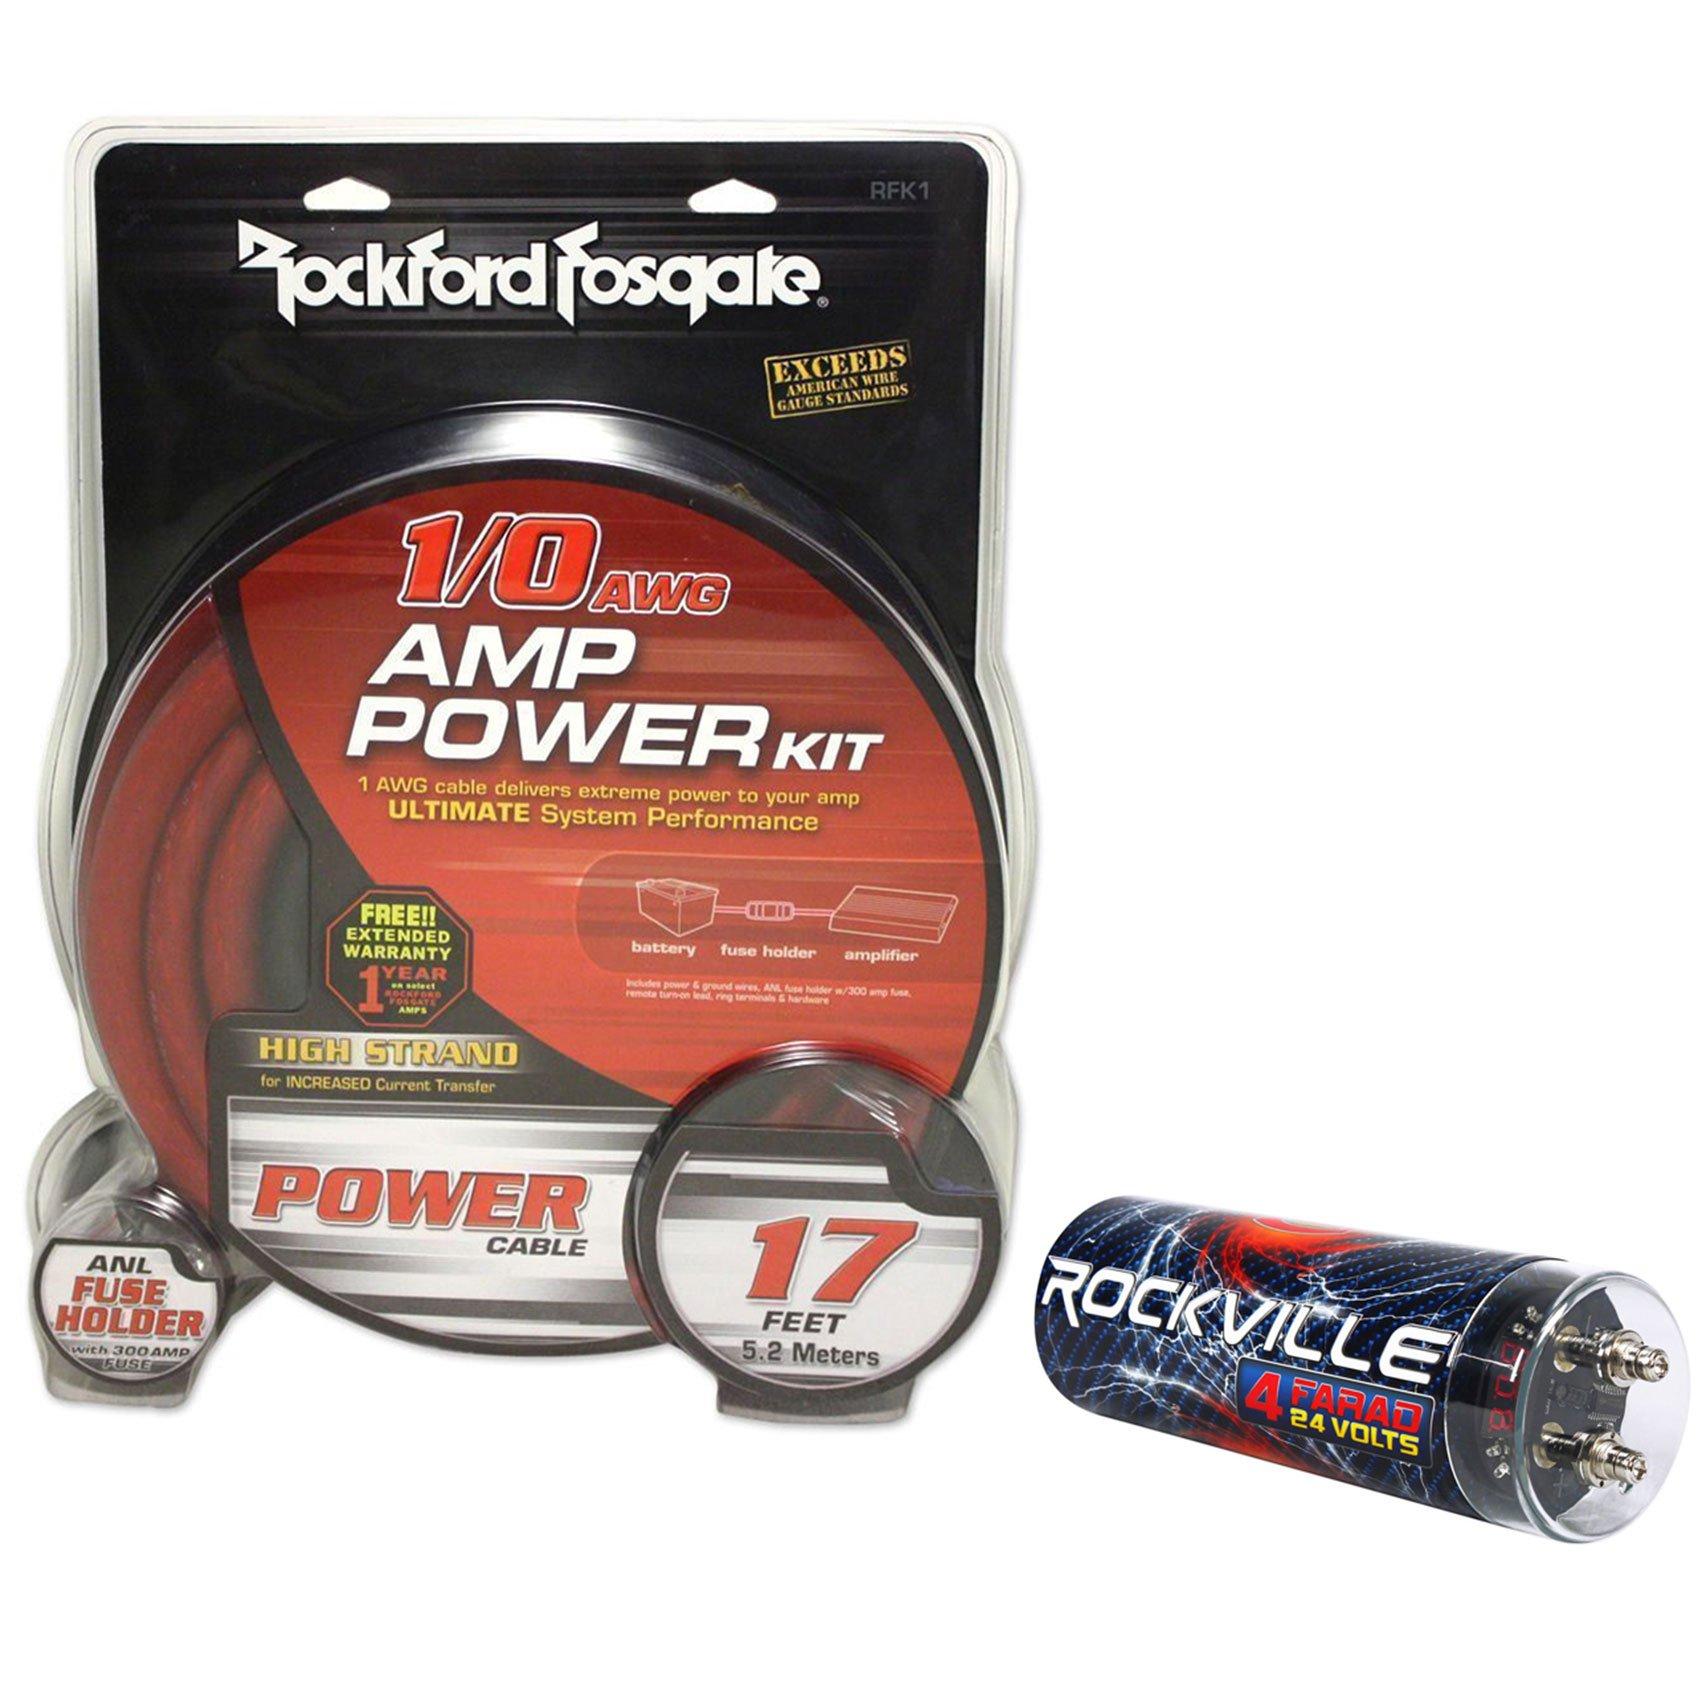 Rockford Fosgate RFK1 1/0 Gauge 100% OFC Copper Amplifier Kit+4 Farad Capacitor by Rockford Fosgate